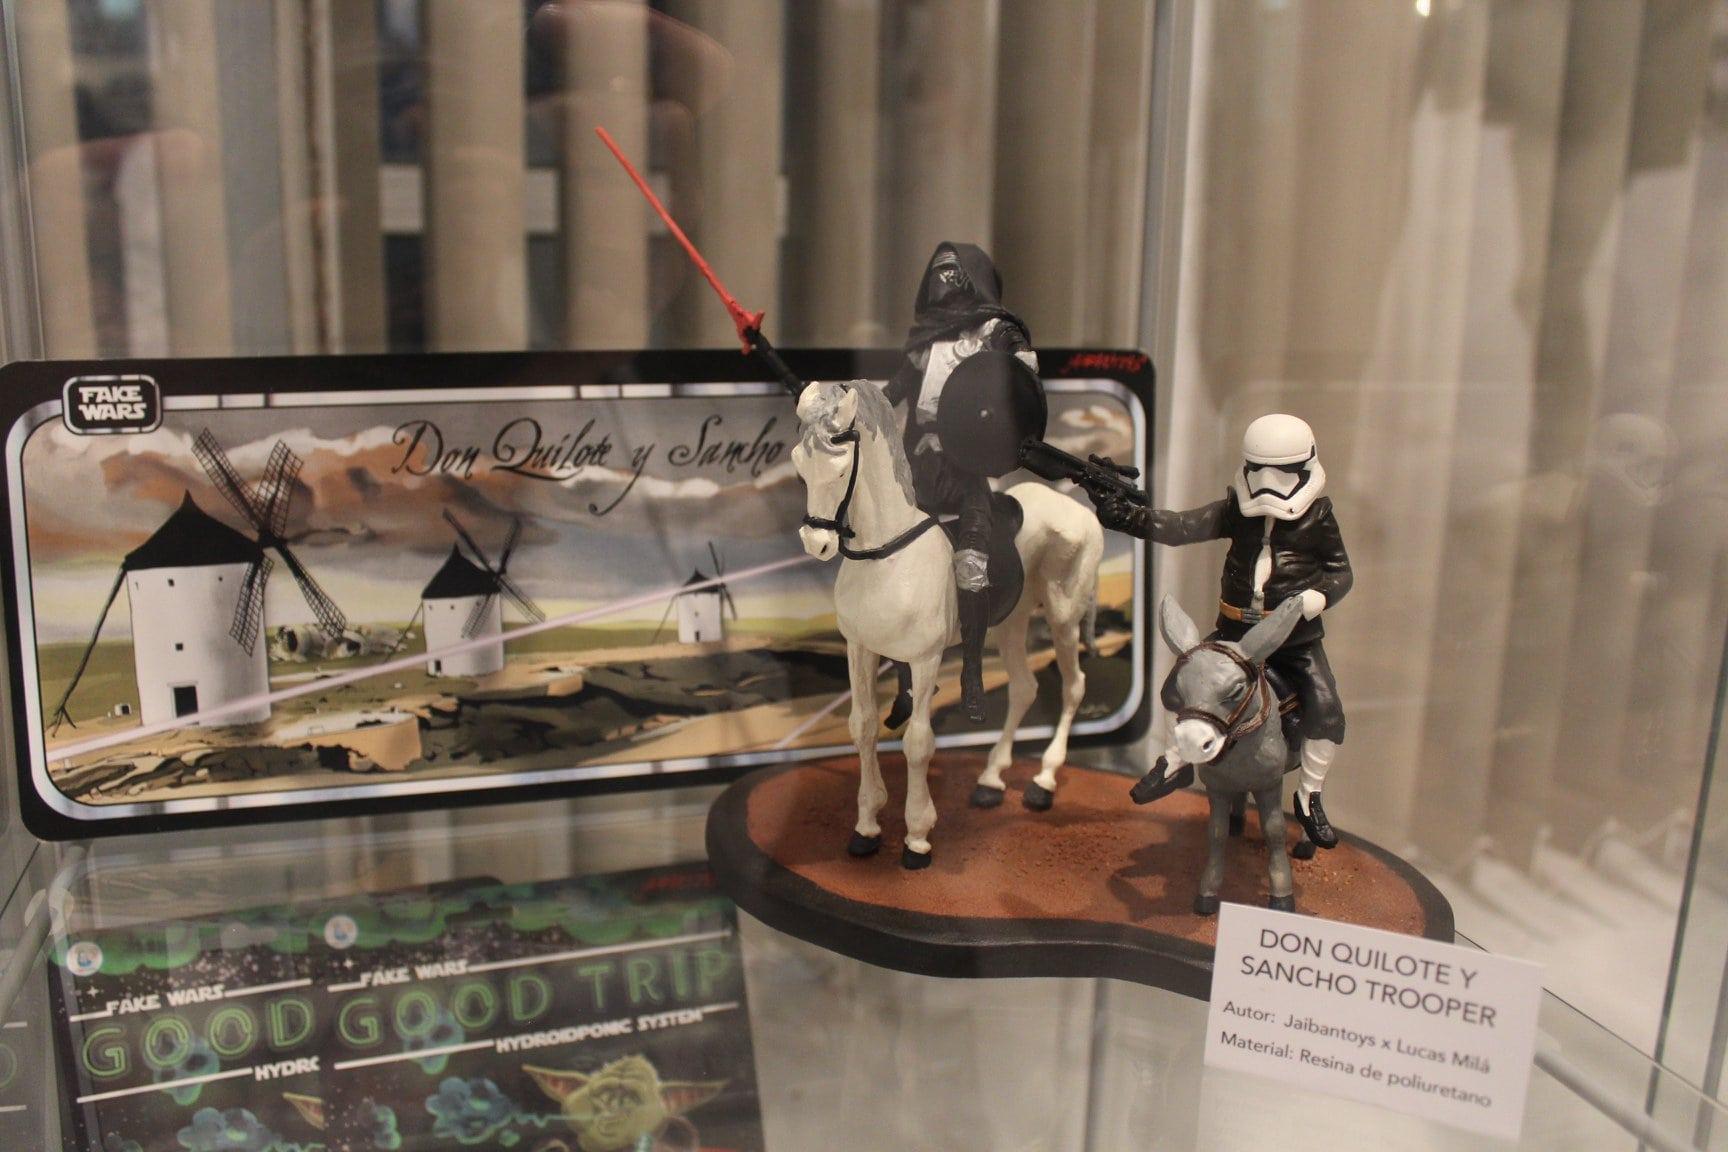 Plastico x Resina - Expo Art Toys Malaga (Jaibantoys)-min